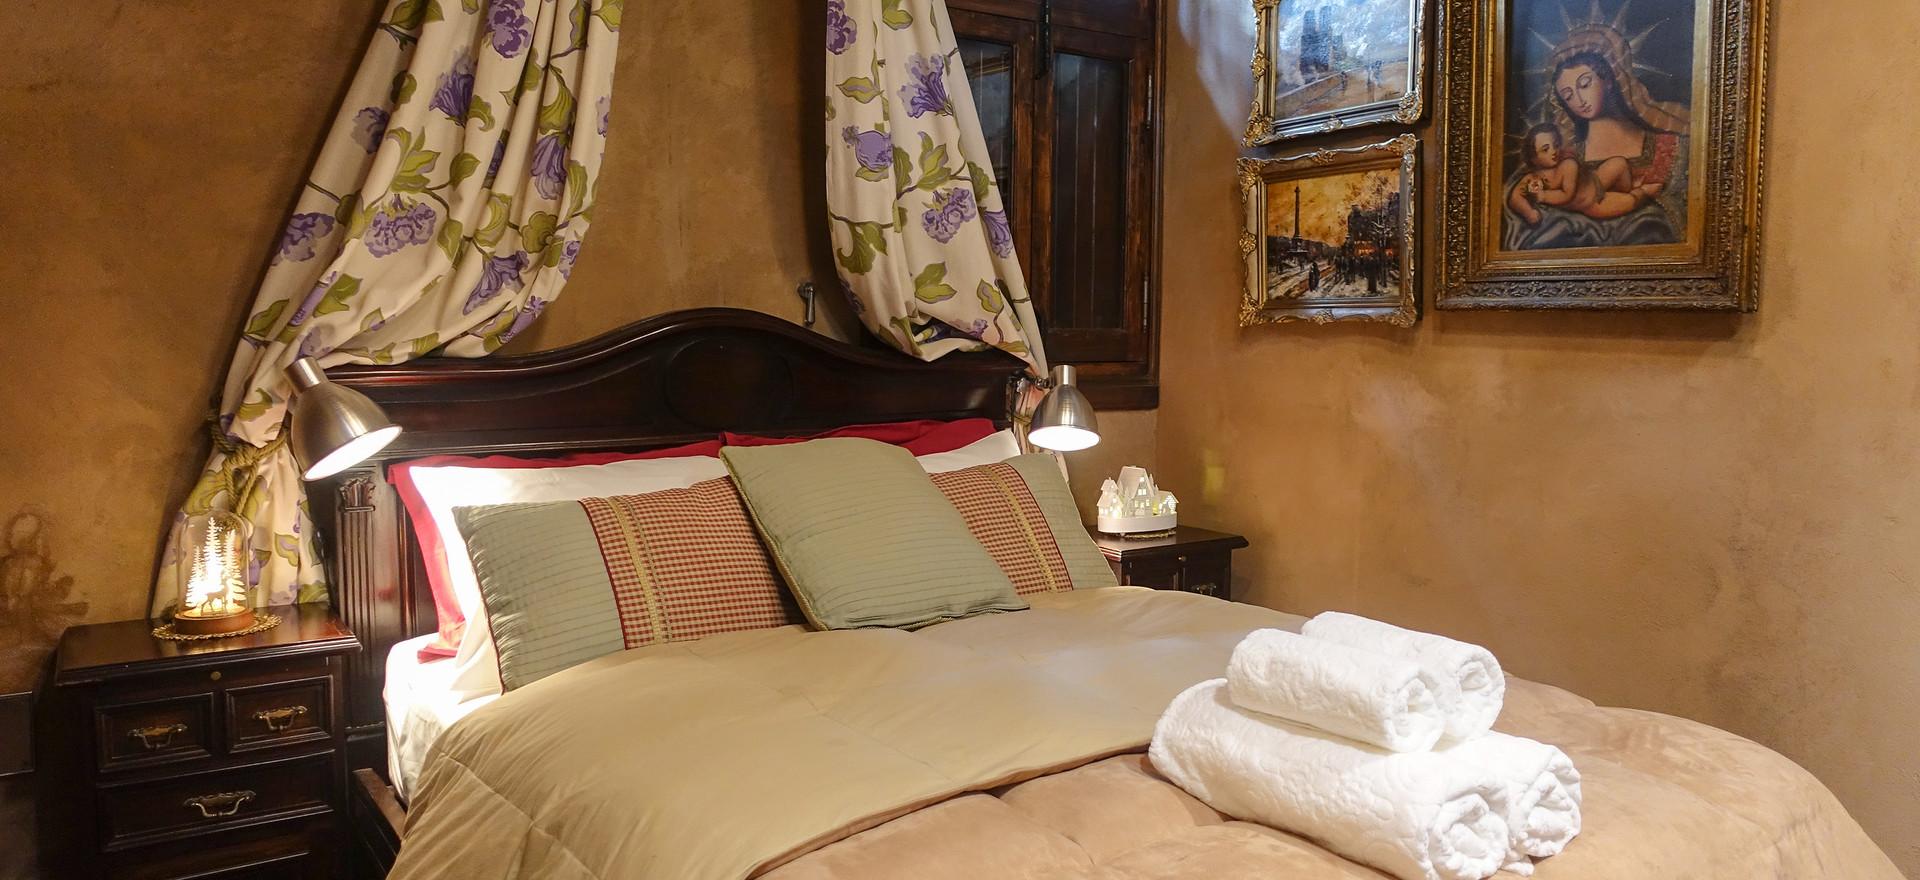 2 guests 26mts2 room + breakfast u$s 195 Por noche